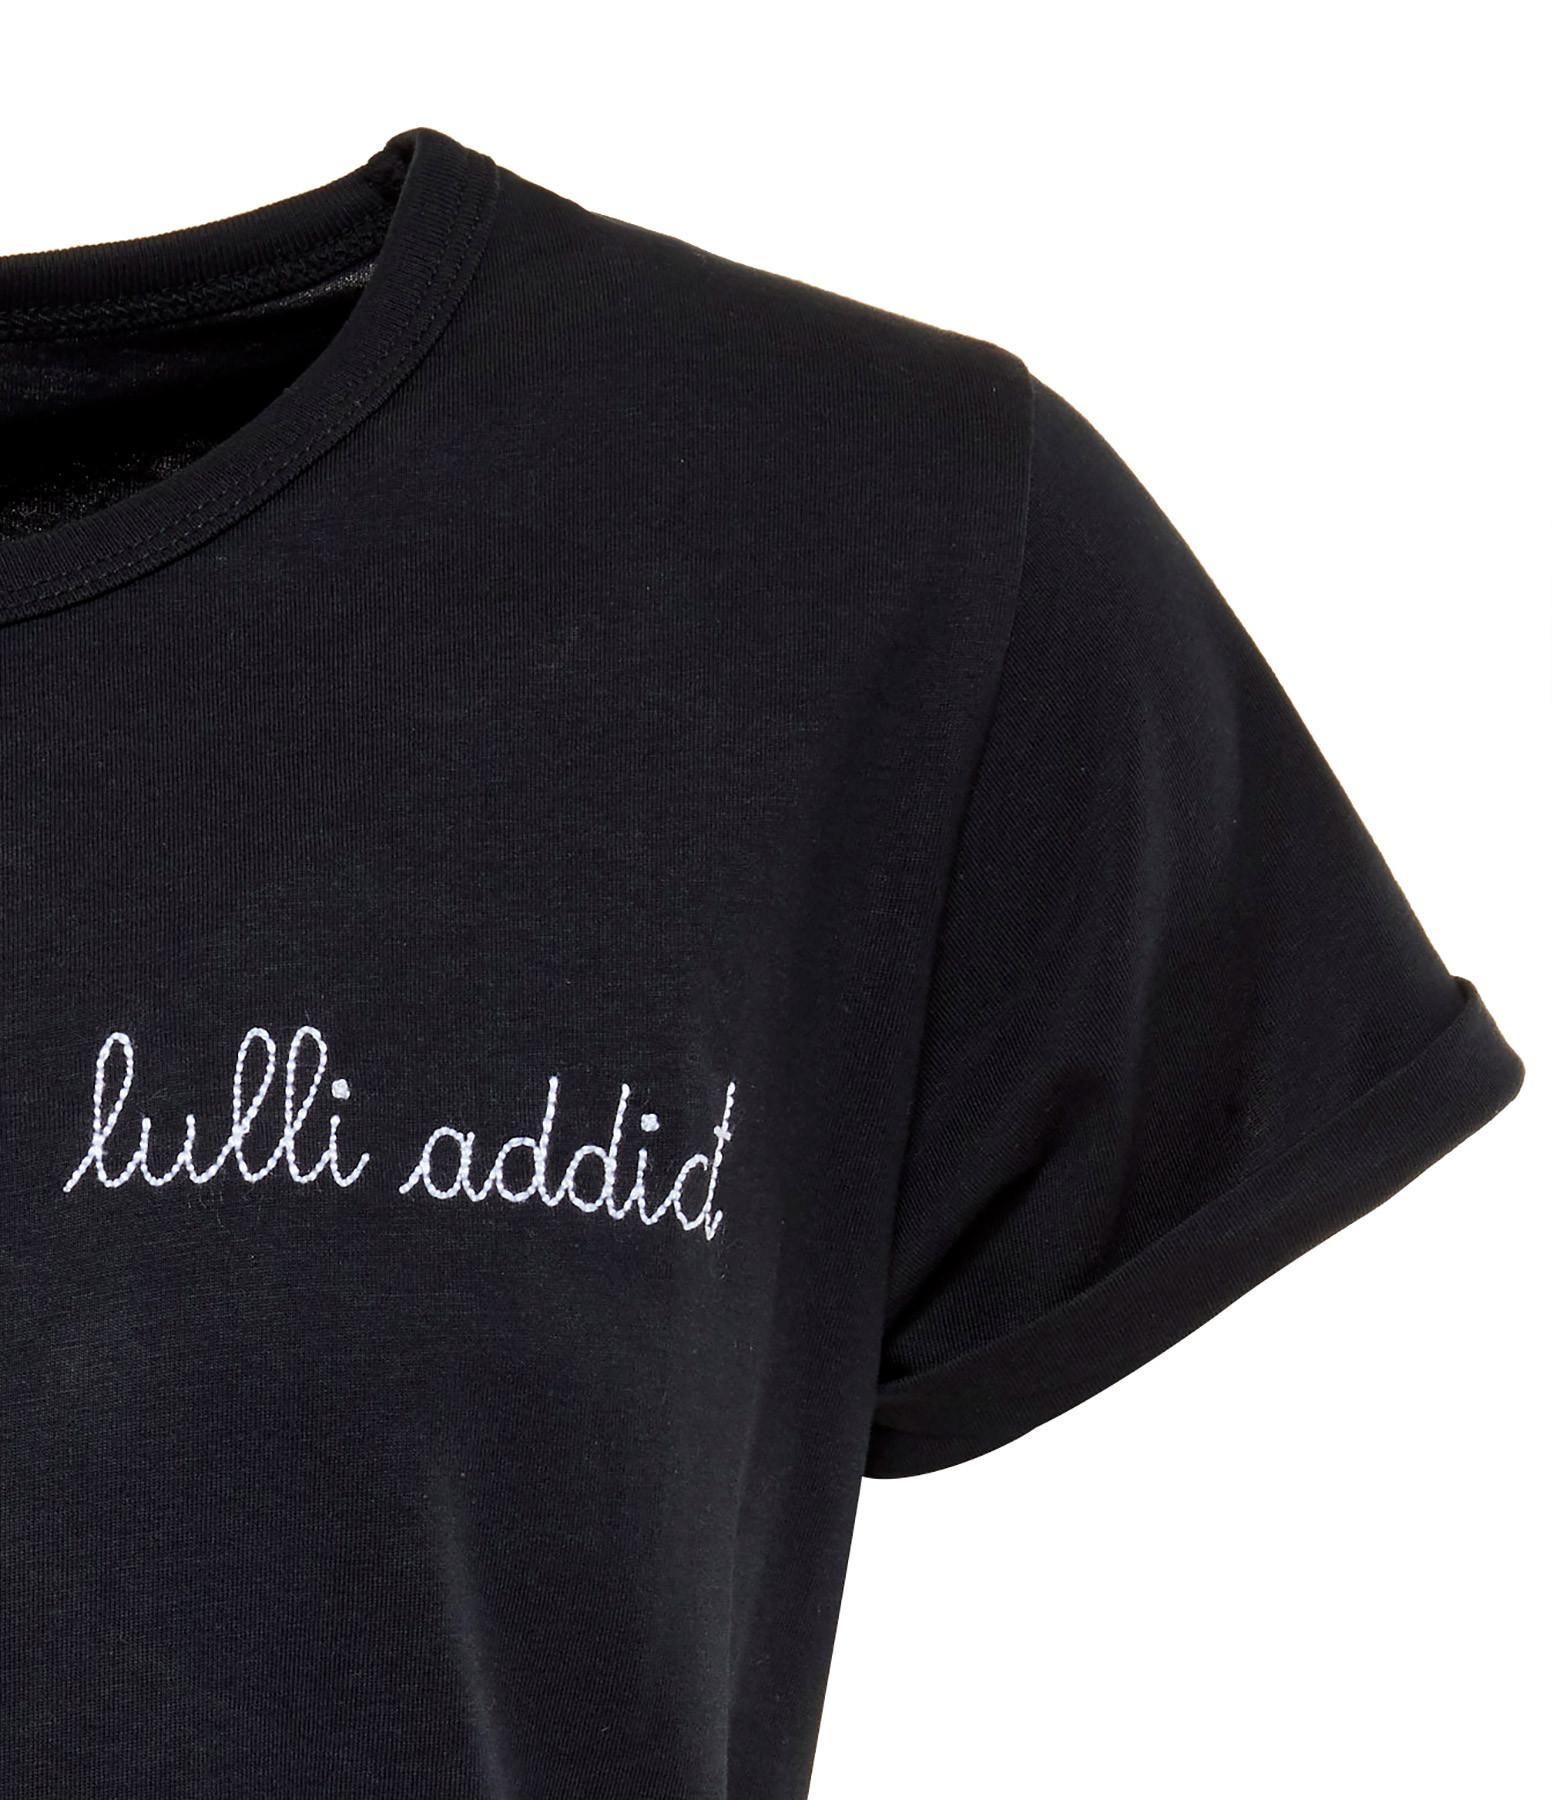 MAISON LABICHE - Tee-shirt Lulli Addictn Noir, Exclusivité Lulli x Maison Labiche